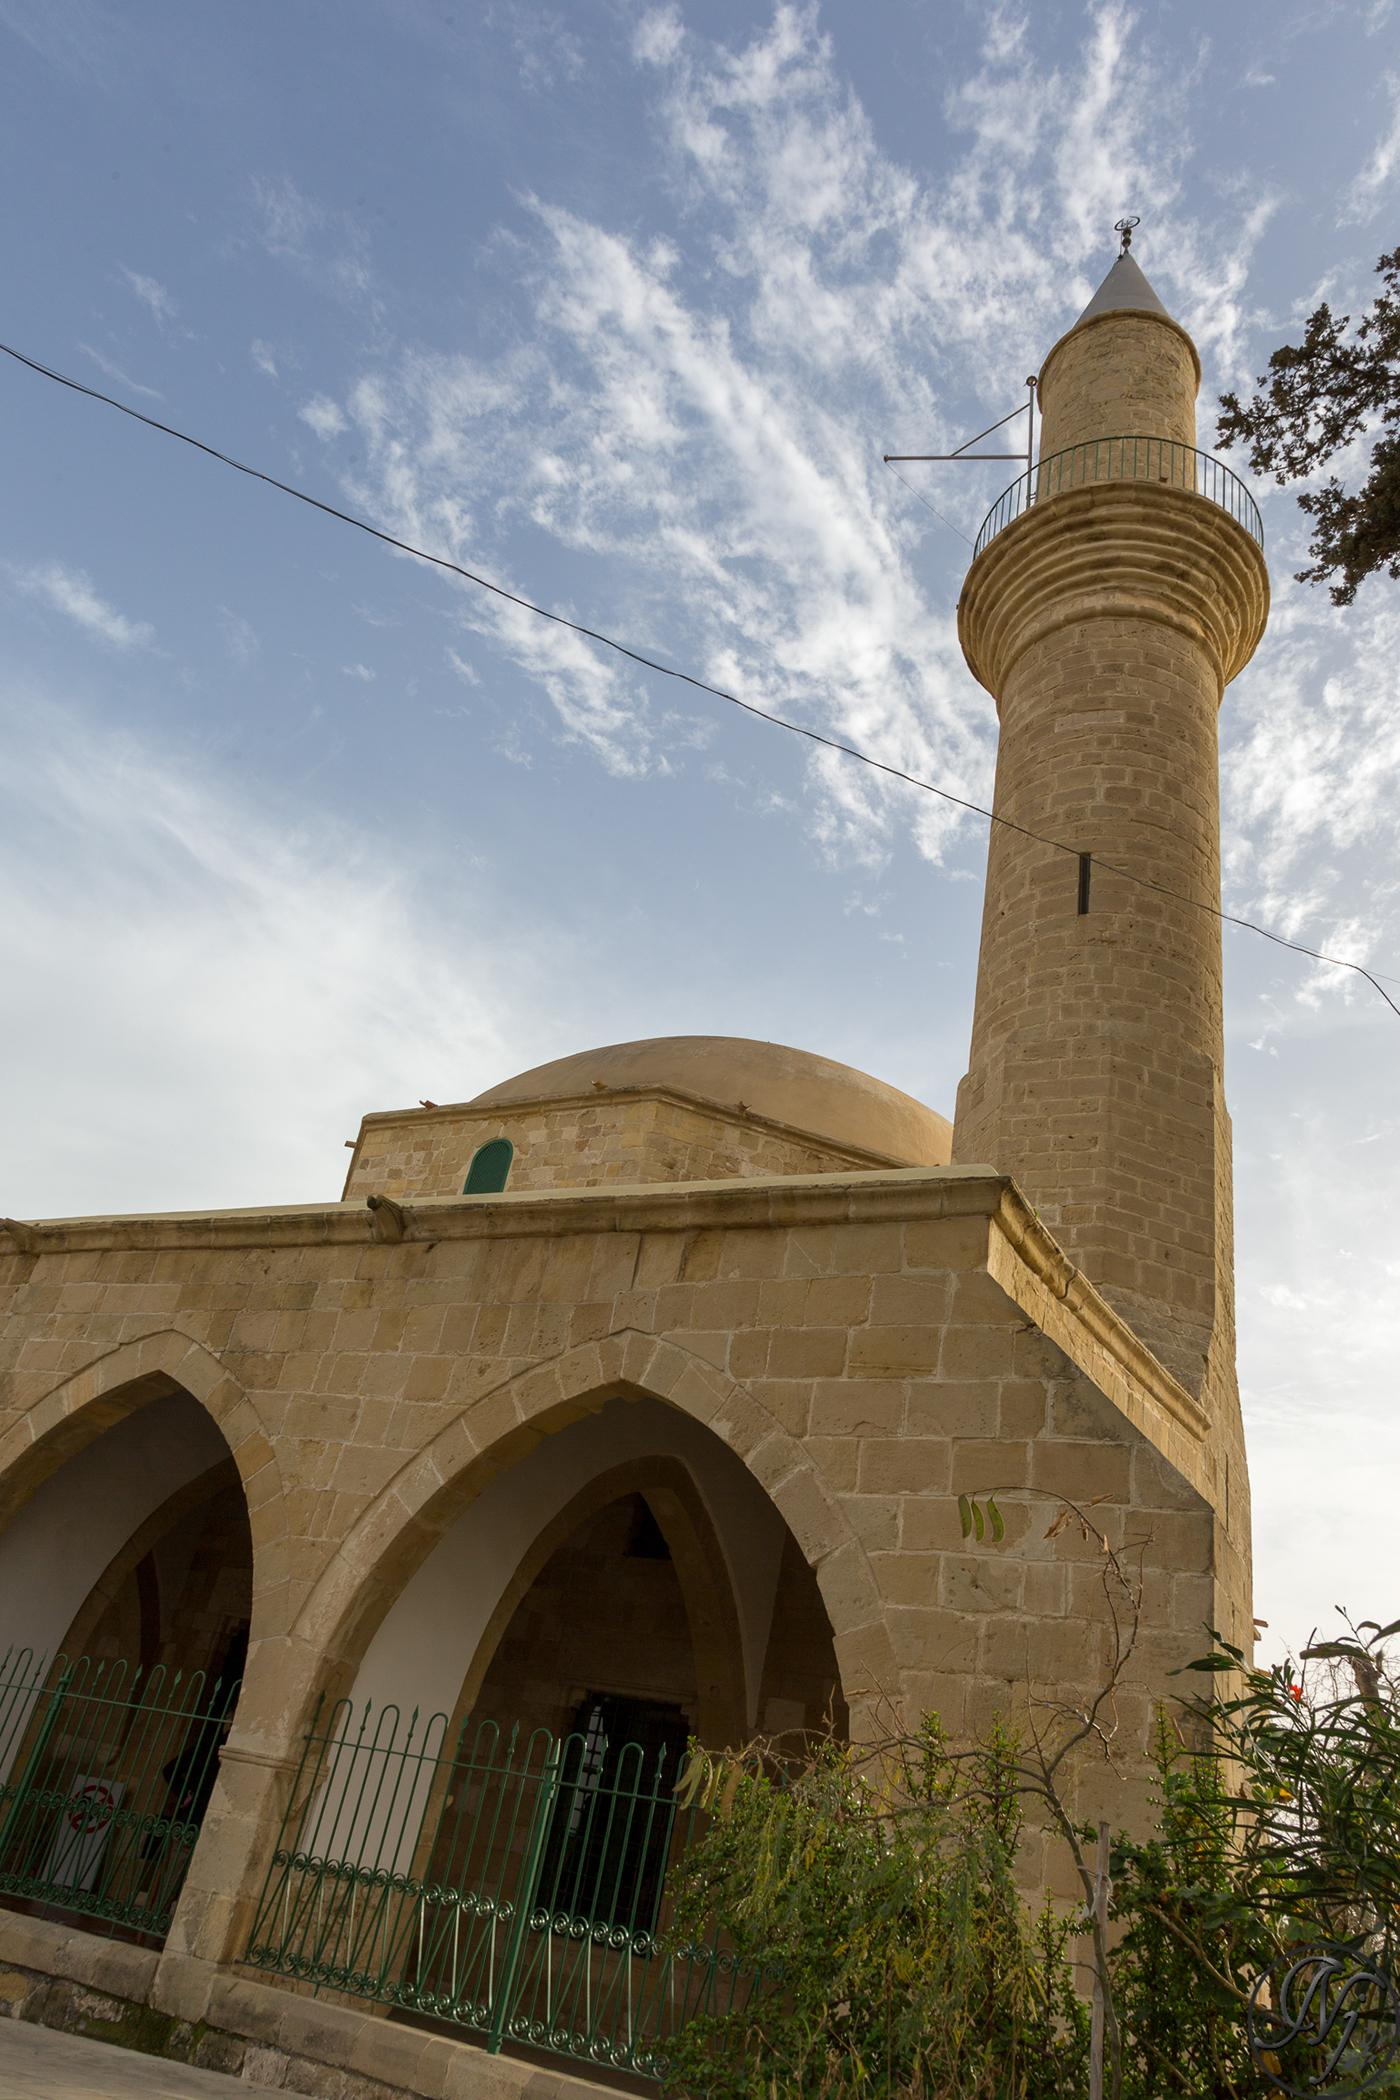 Hala sultan tekke on behance hala sultan tekke complex is composed of a mosque mausoleum minaret cemetery and living quarters for men and women the term tekke convent applies to altavistaventures Images